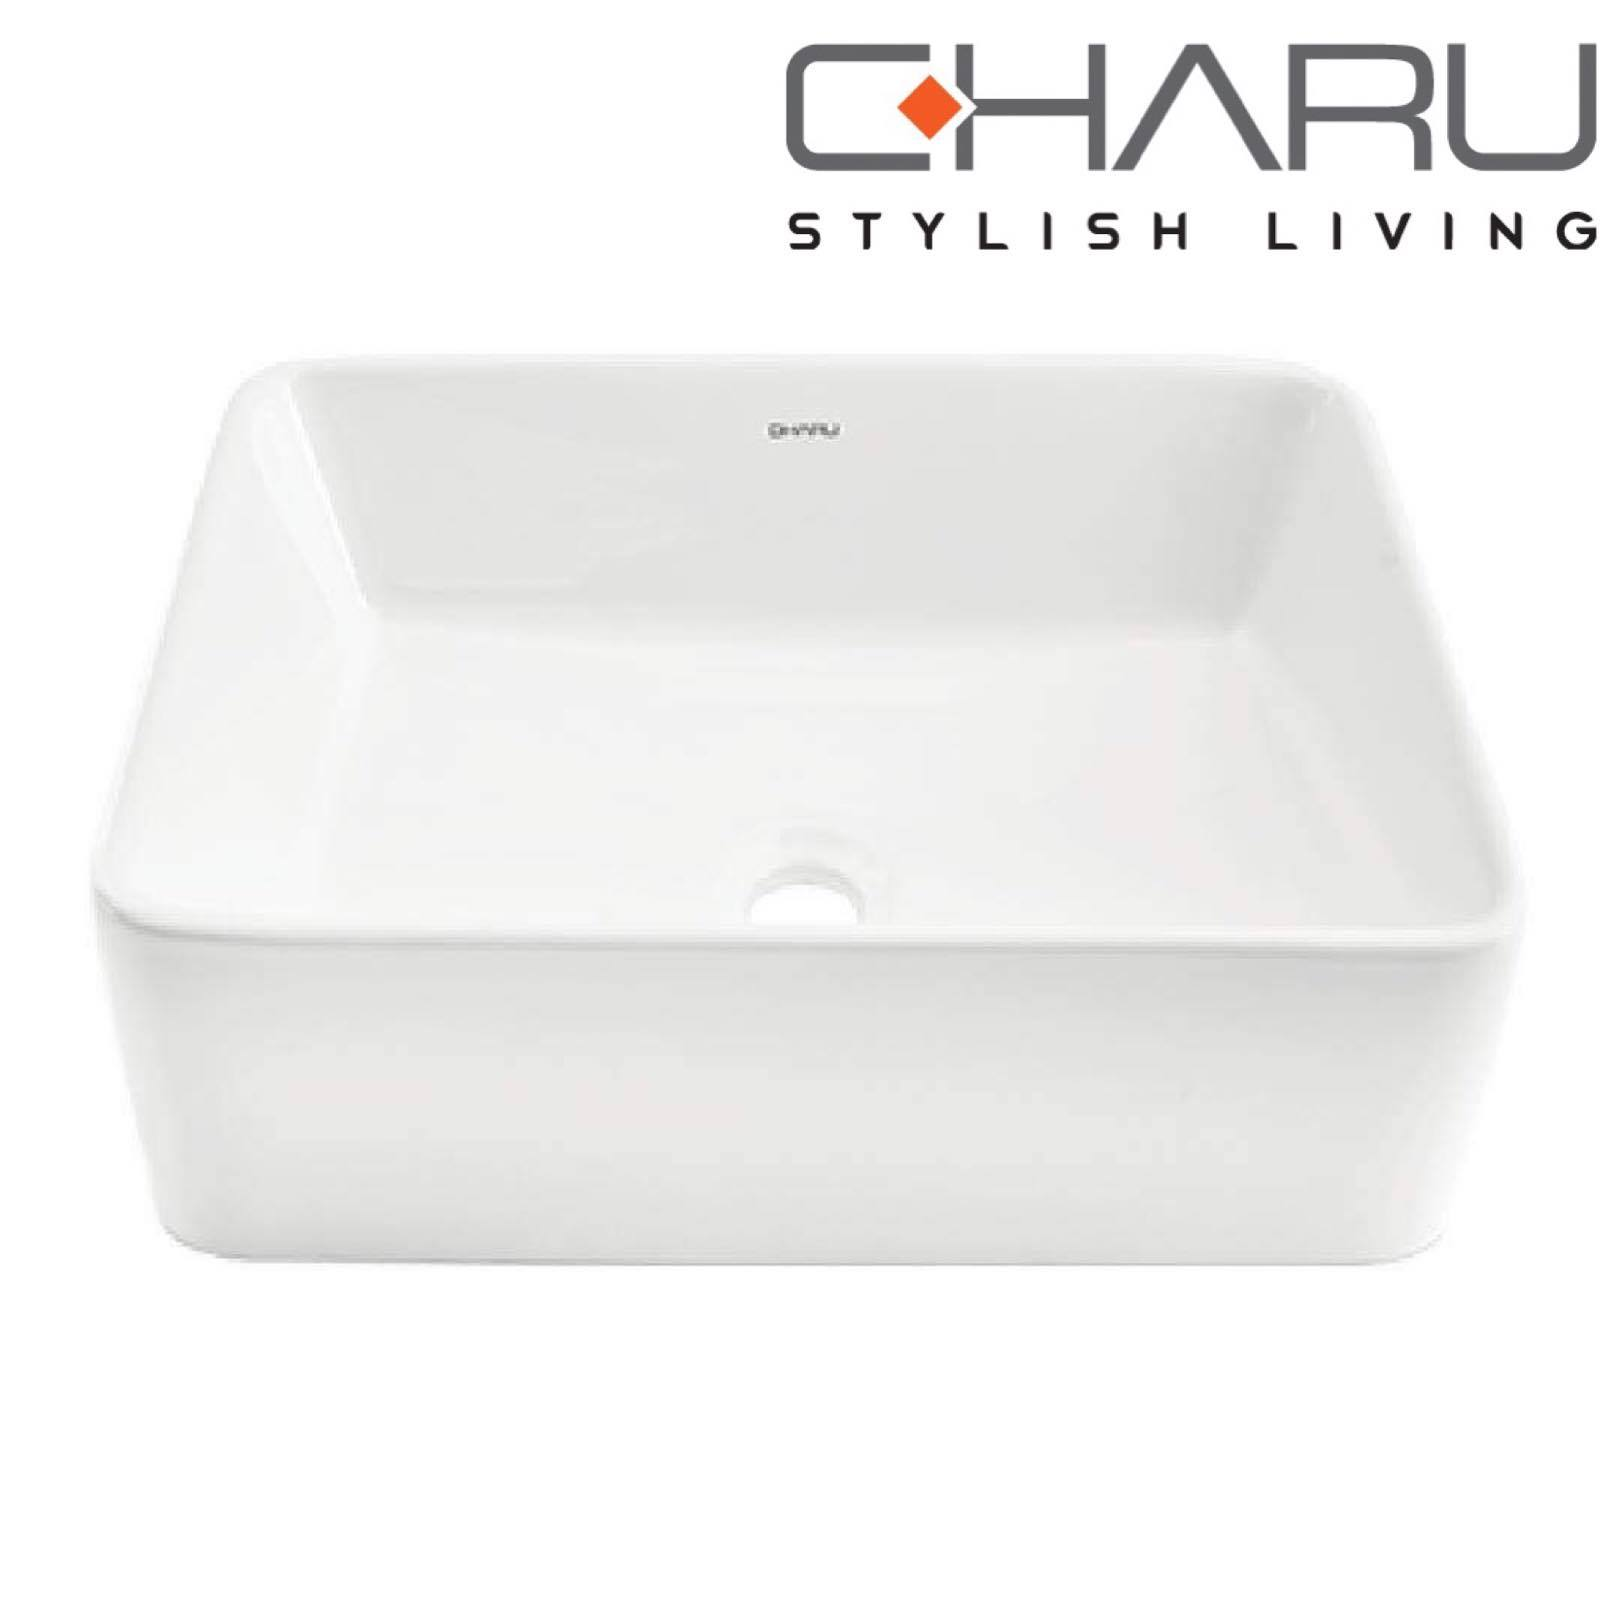 Charu online shopping